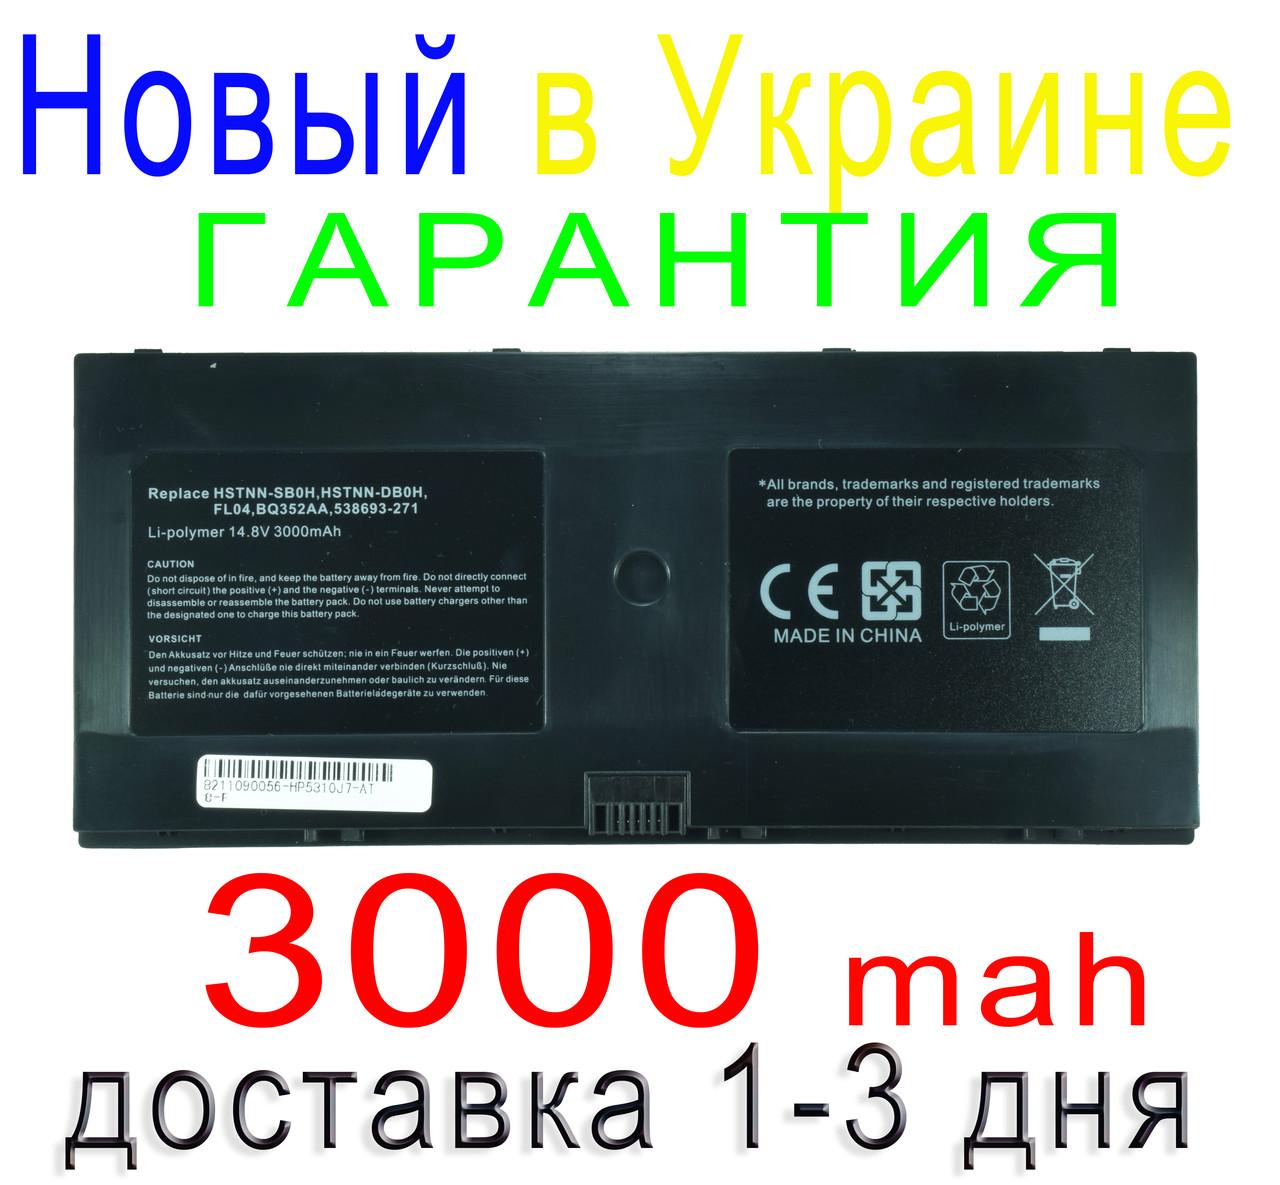 Аккумулятор батарея HP ProBook 5310m 5320m FL04 538693-271 538693-961 580956-001 AT907AA  BQ352AA